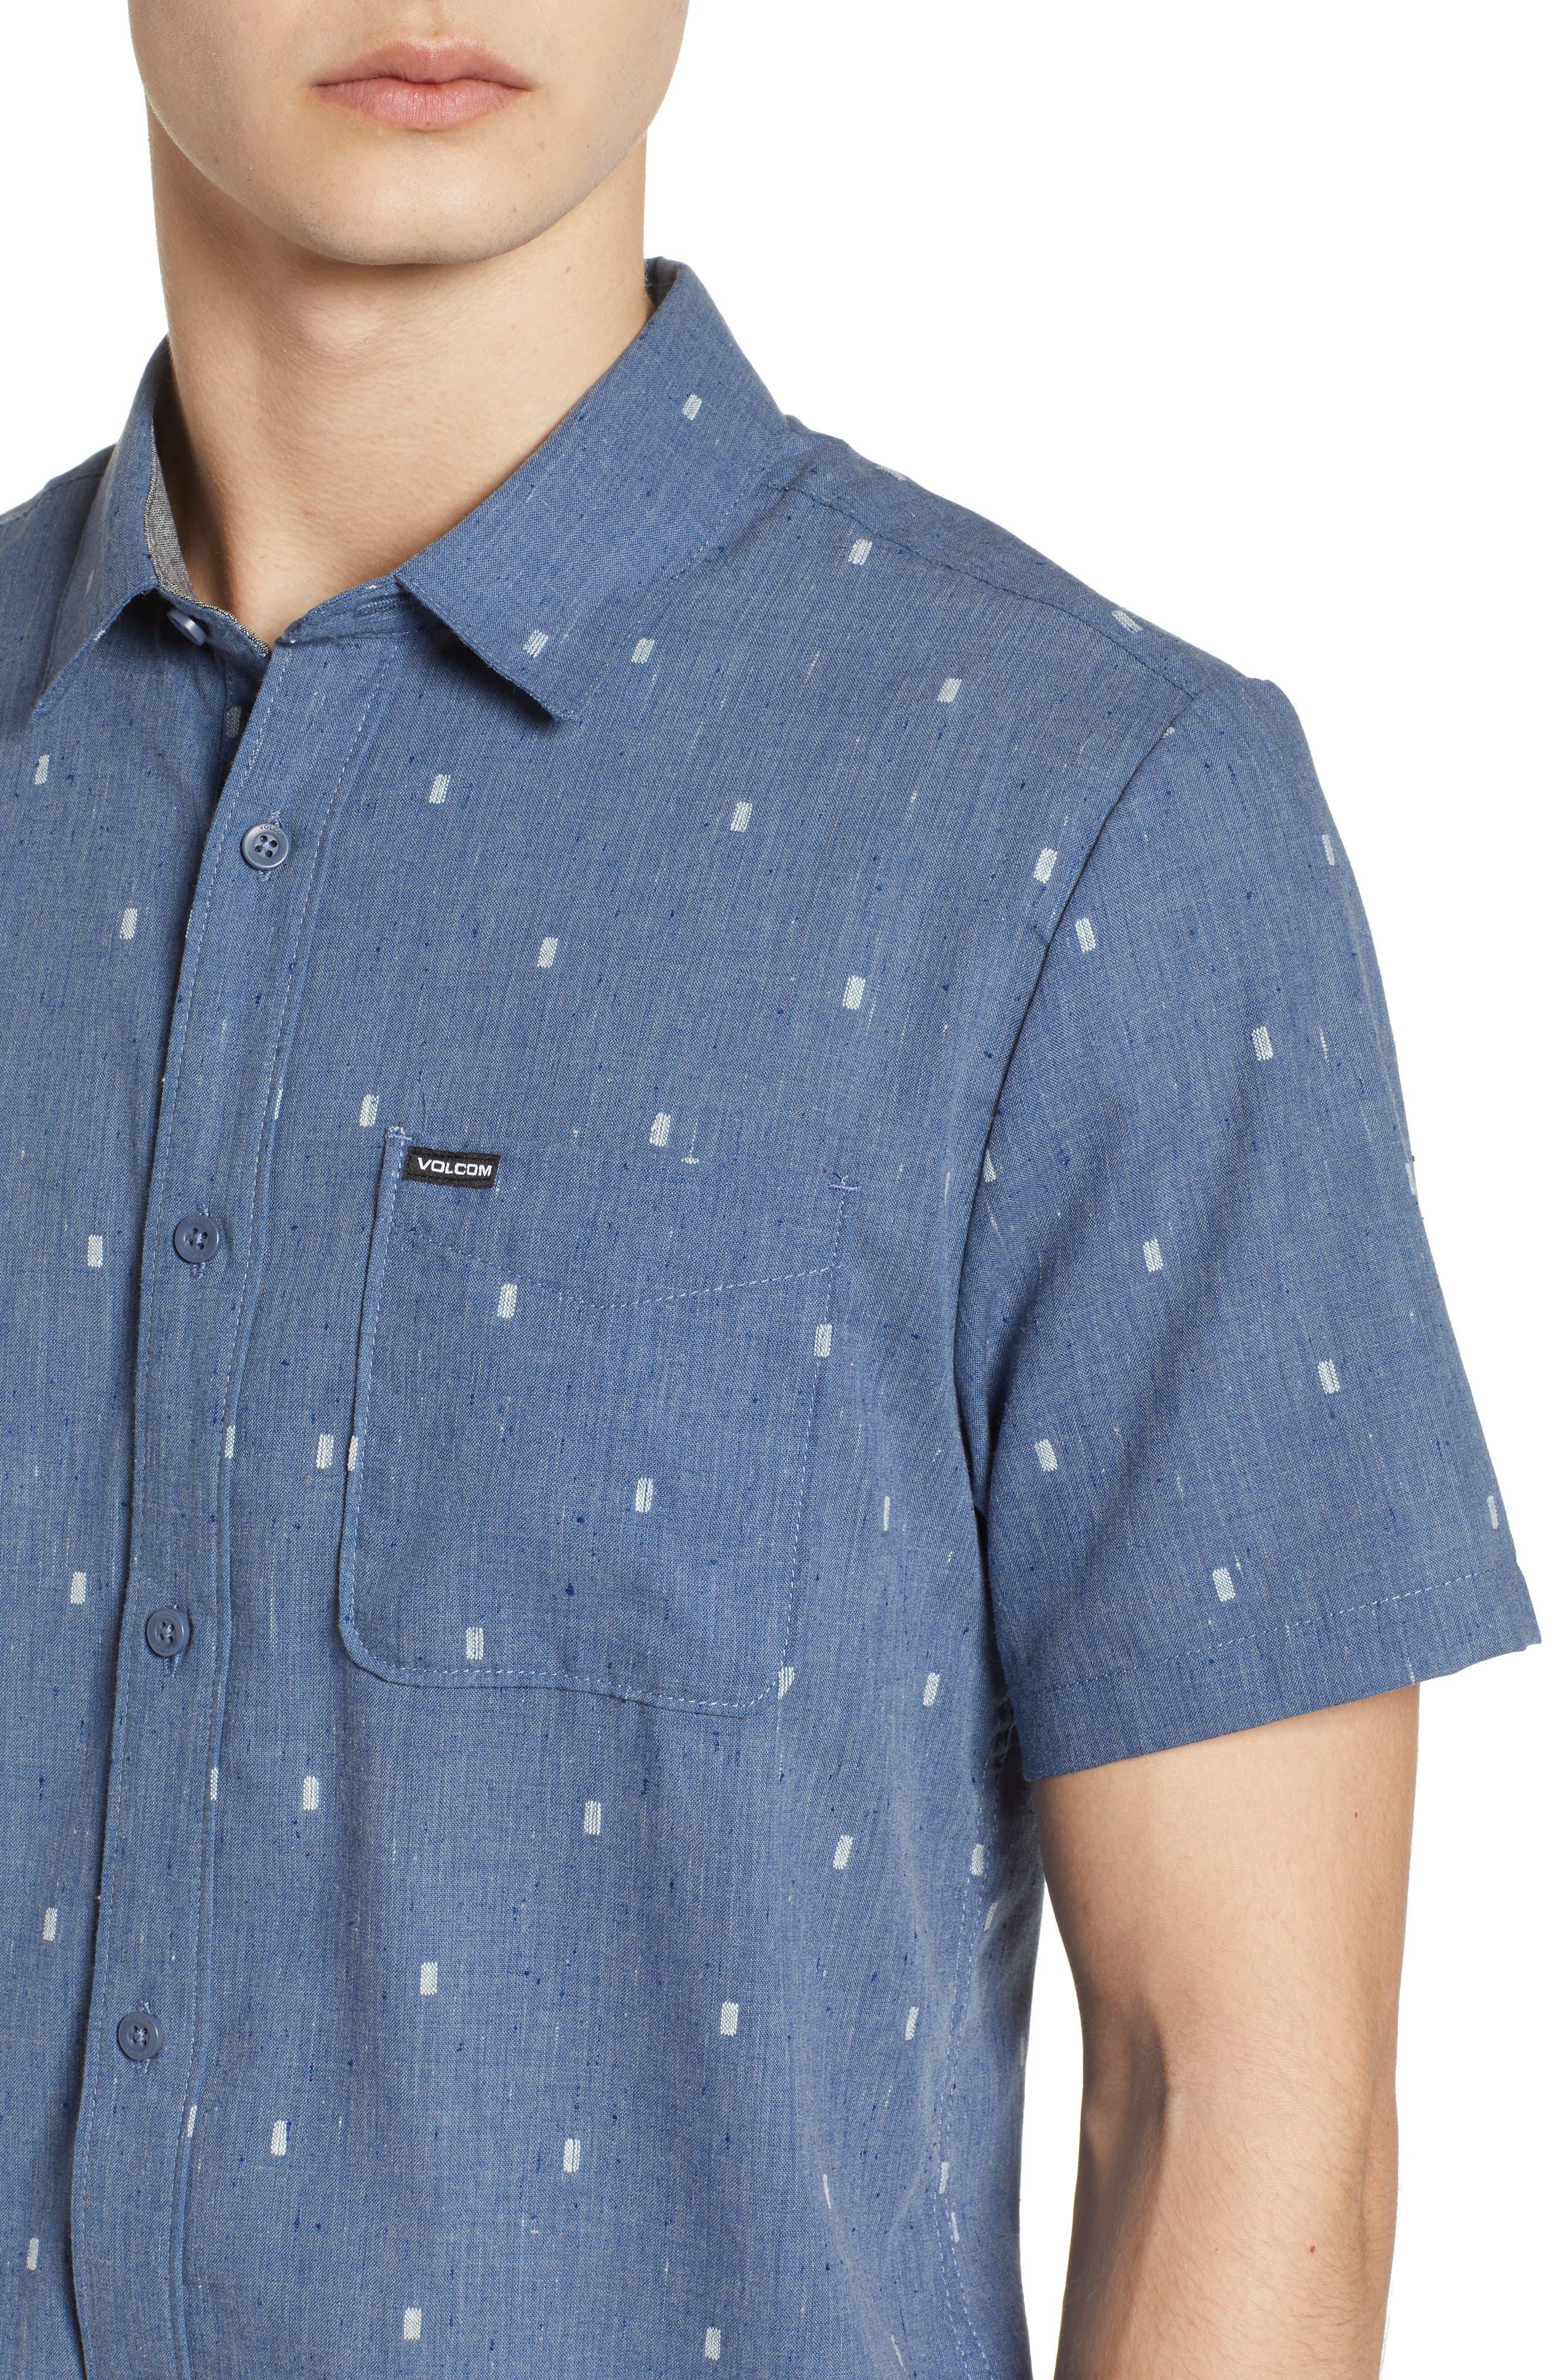 Gladstone Short Sleeve Shirt,                             Alternate thumbnail 4, color,                             Deep Blue